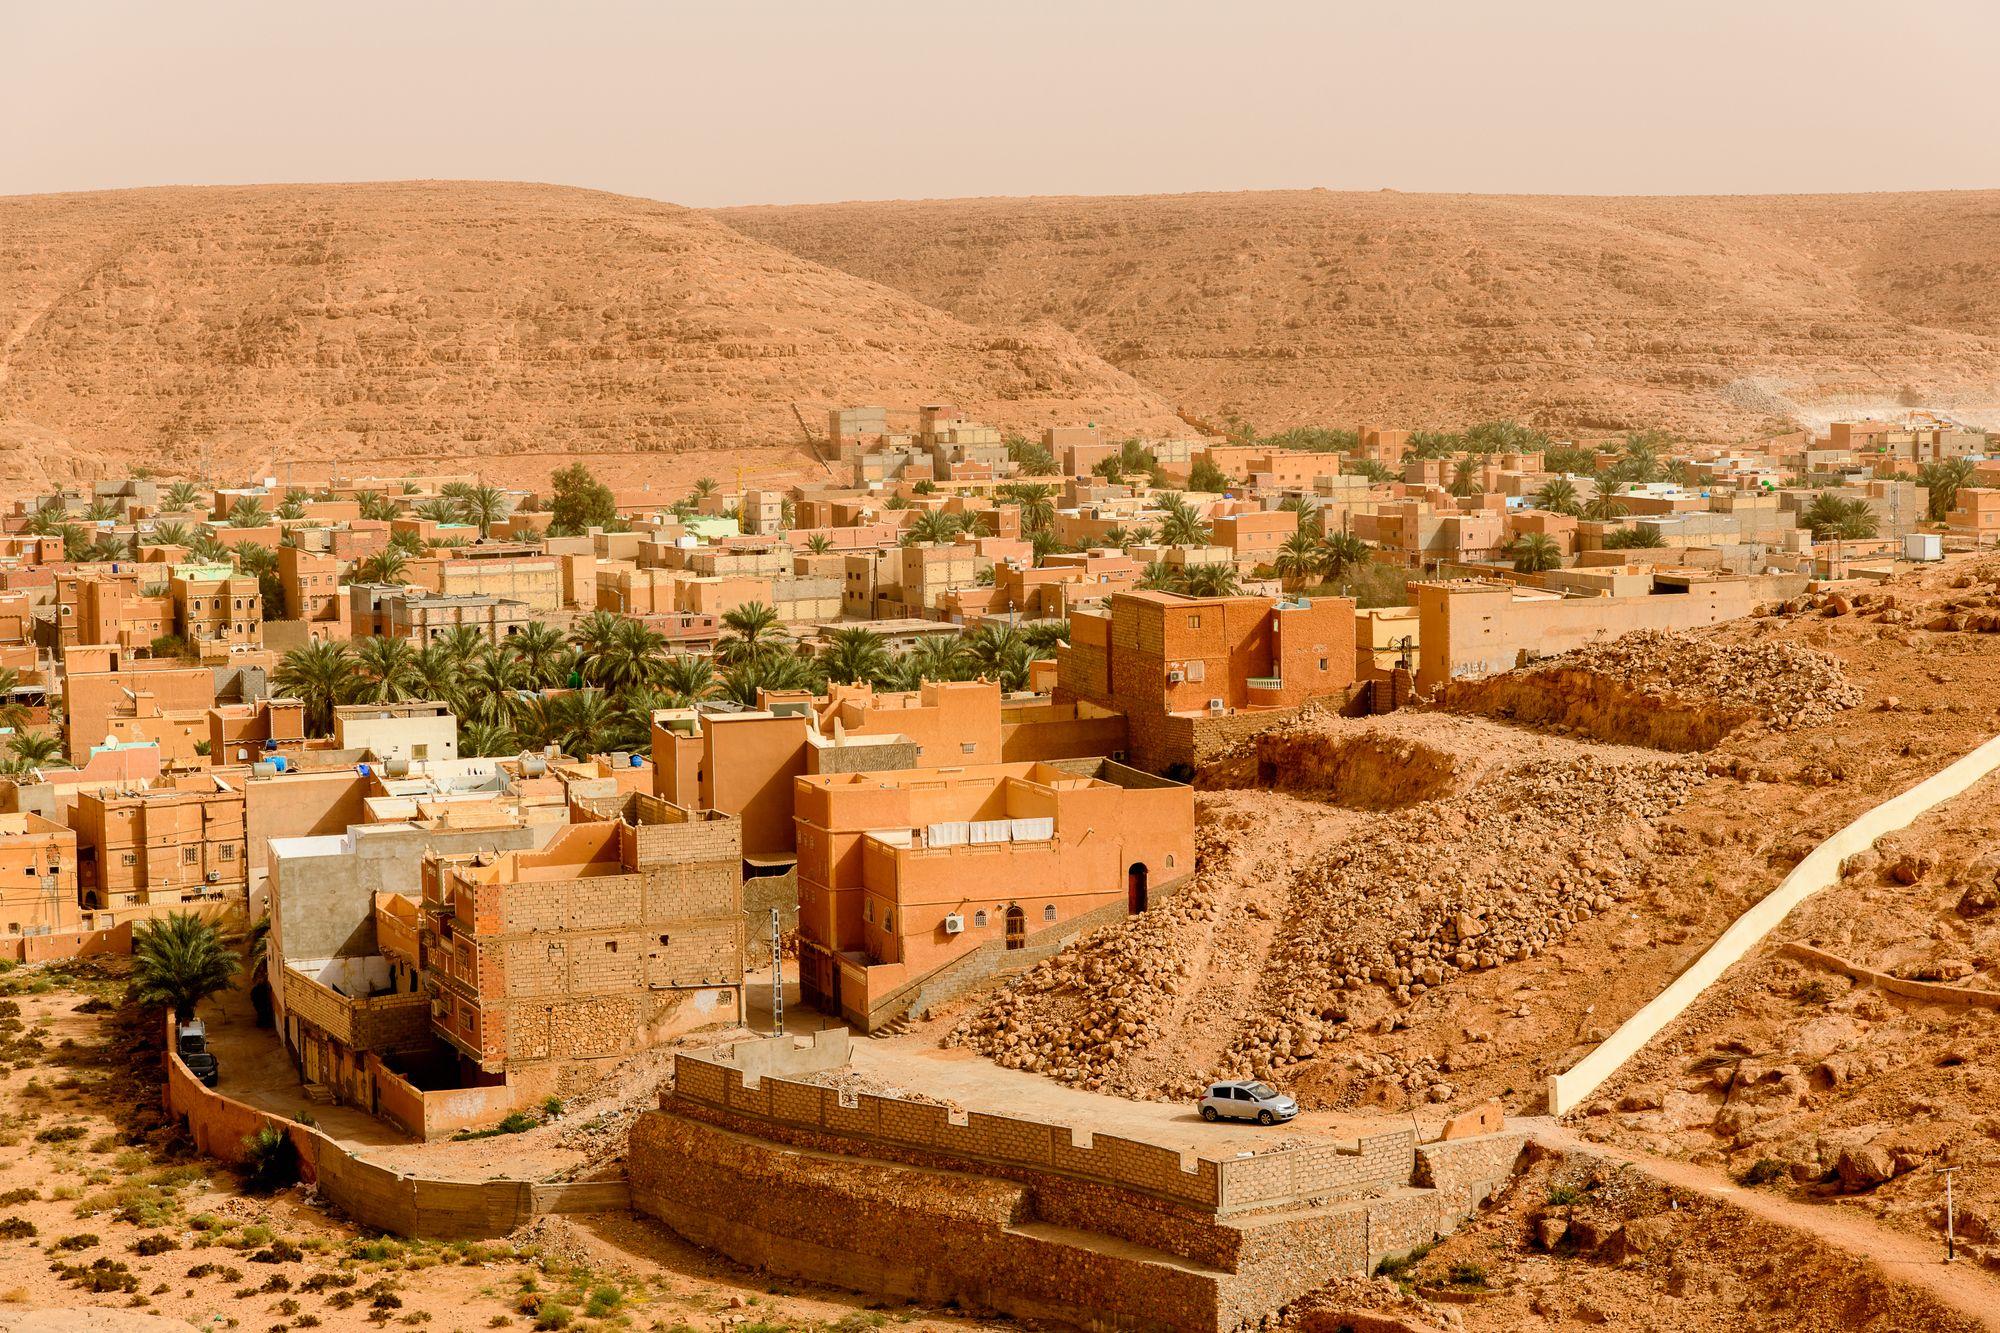 Panorama of Ghardaia (Tagherdayt), Algeria, UNESCO world heritage site